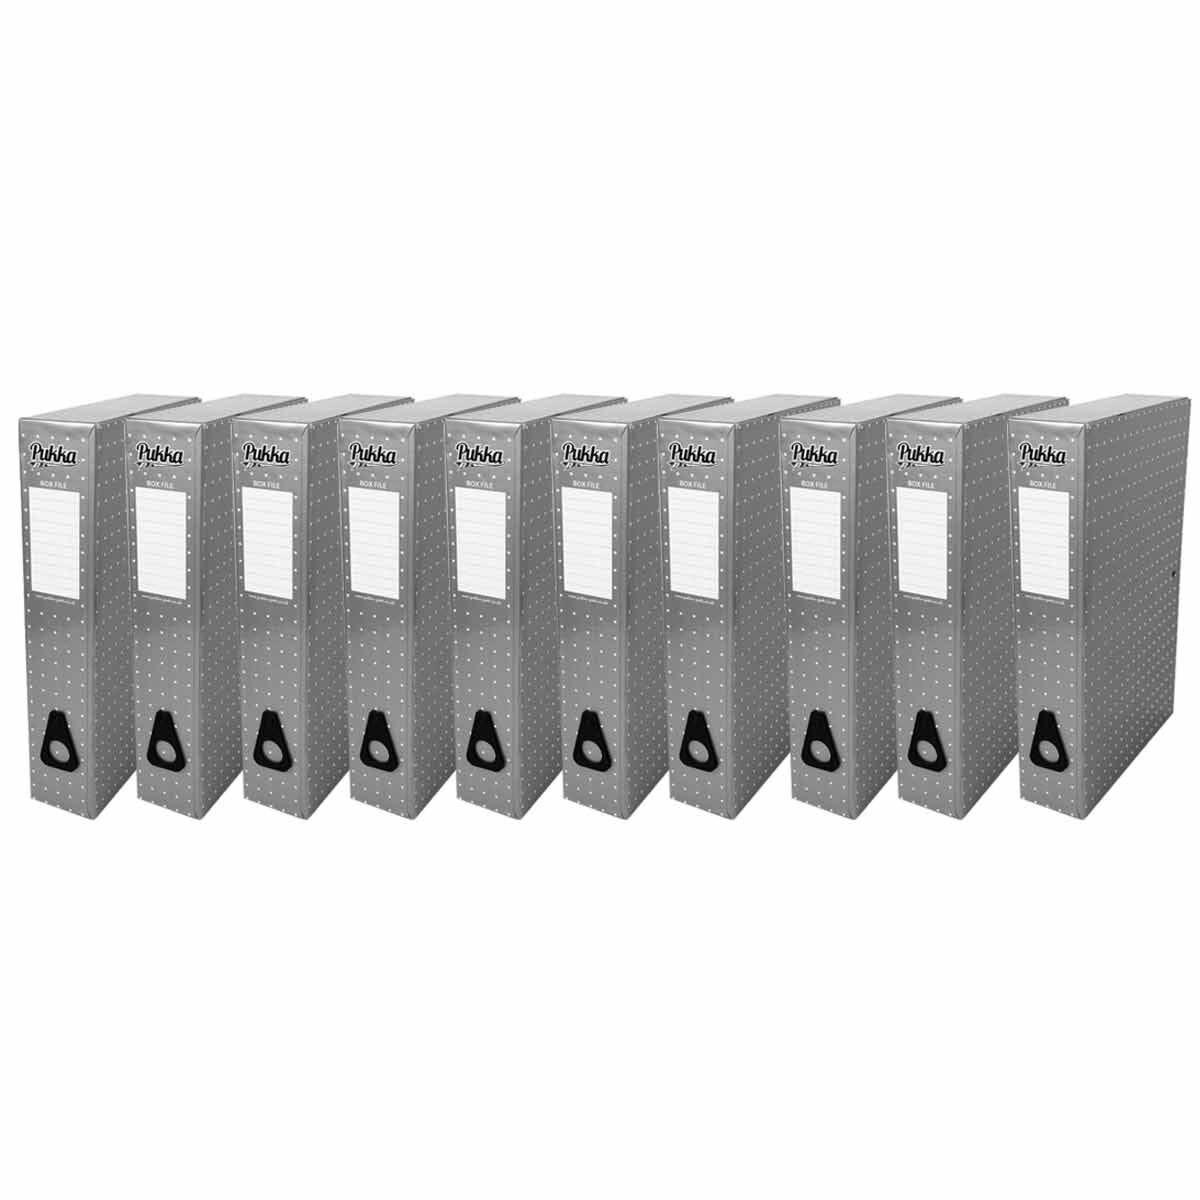 Pukka Metallic Foolscap Box File Pack of 10 Metallic Silver